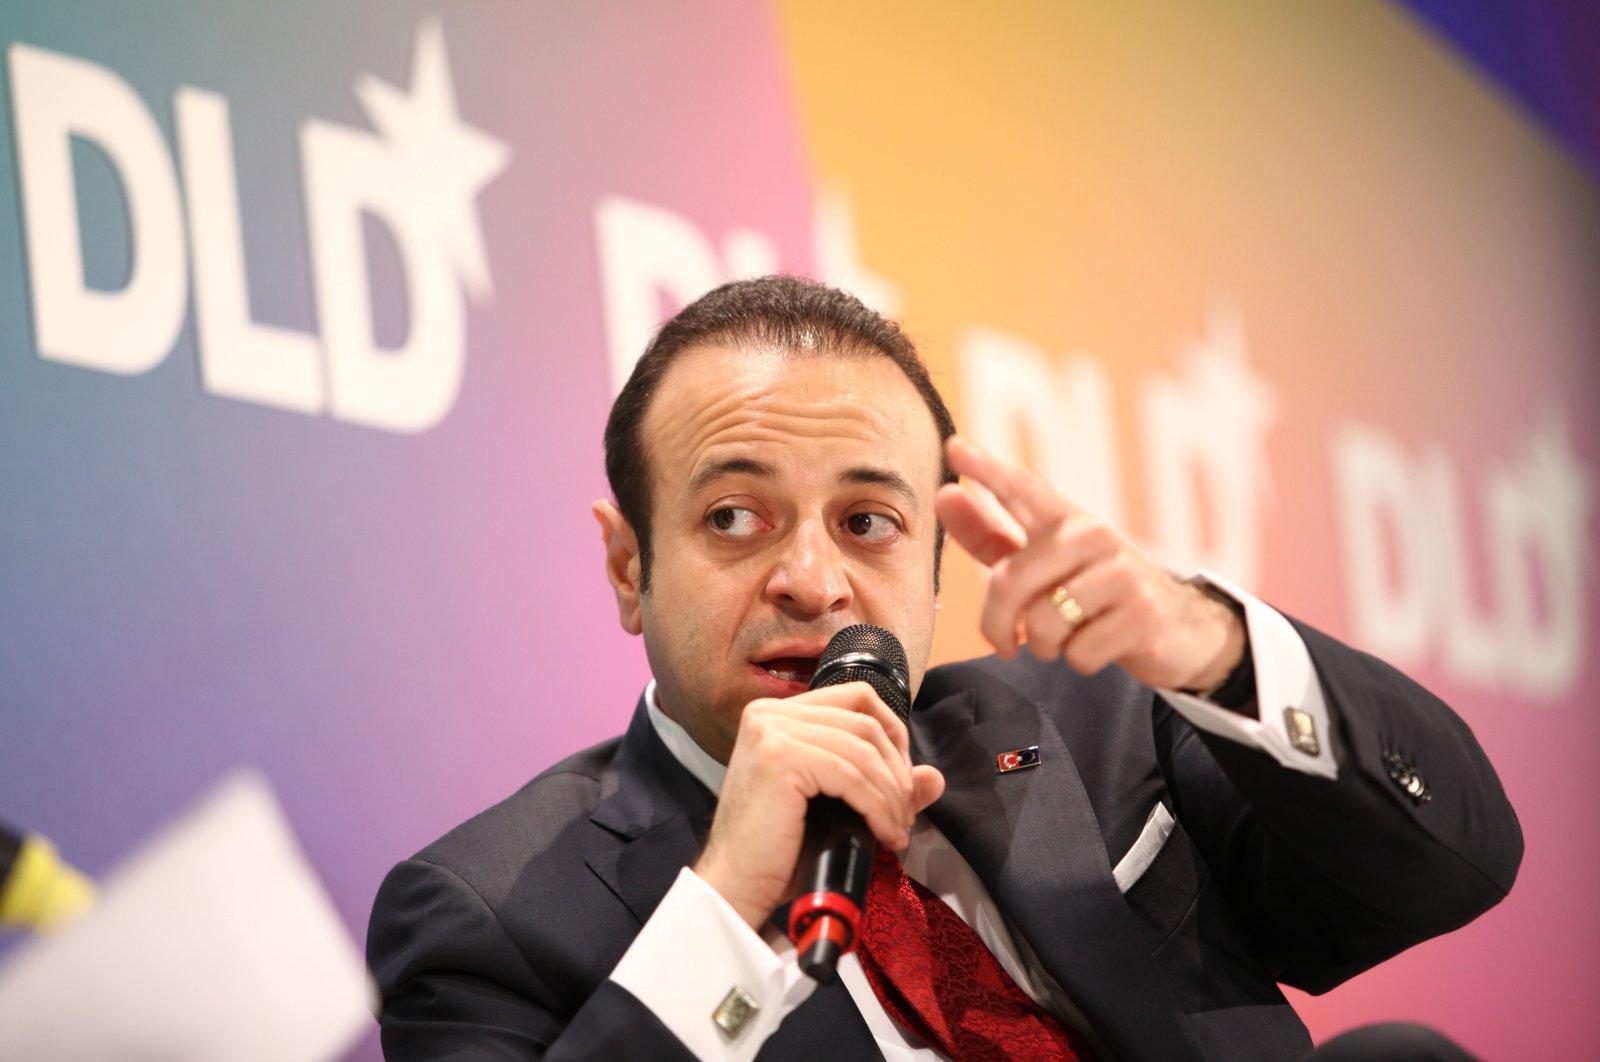 Turkish politician Egemen Bağış speaks during the Digital Life Design conference (DLD) at HVB Forum in Munich, Germany, Jan. 24, 2012. (Getty Images File Photo)